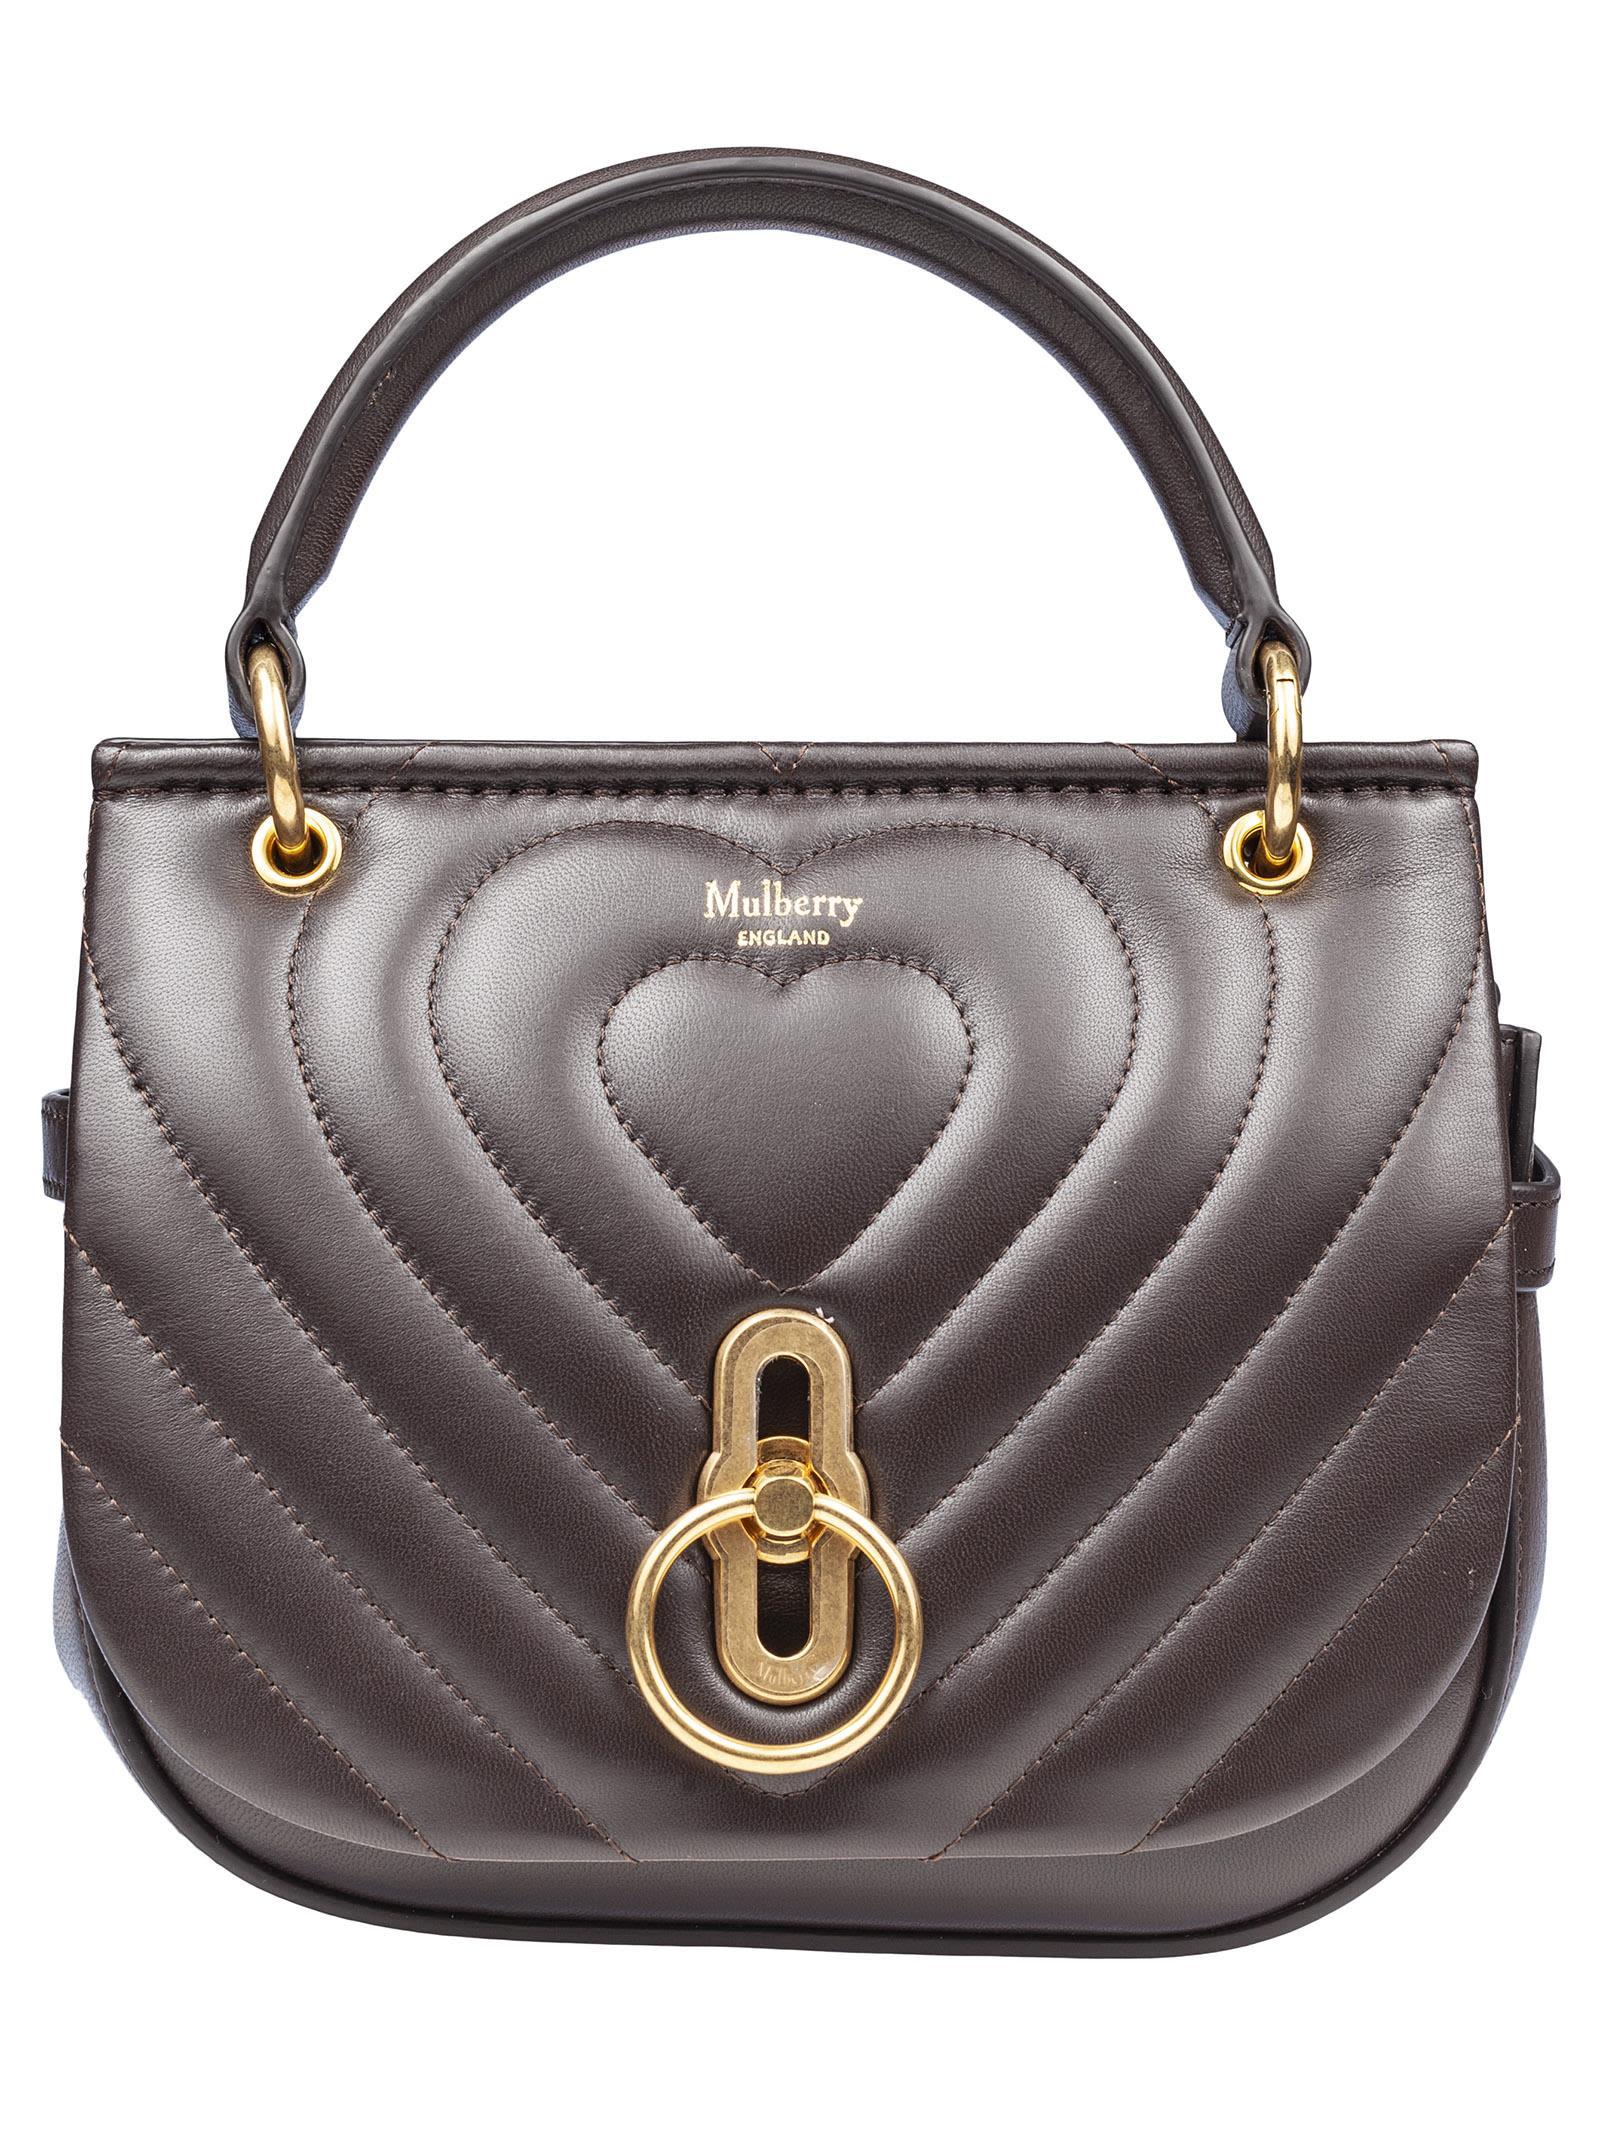 Small Amberley Shoulder Bag in Chocolate Brown